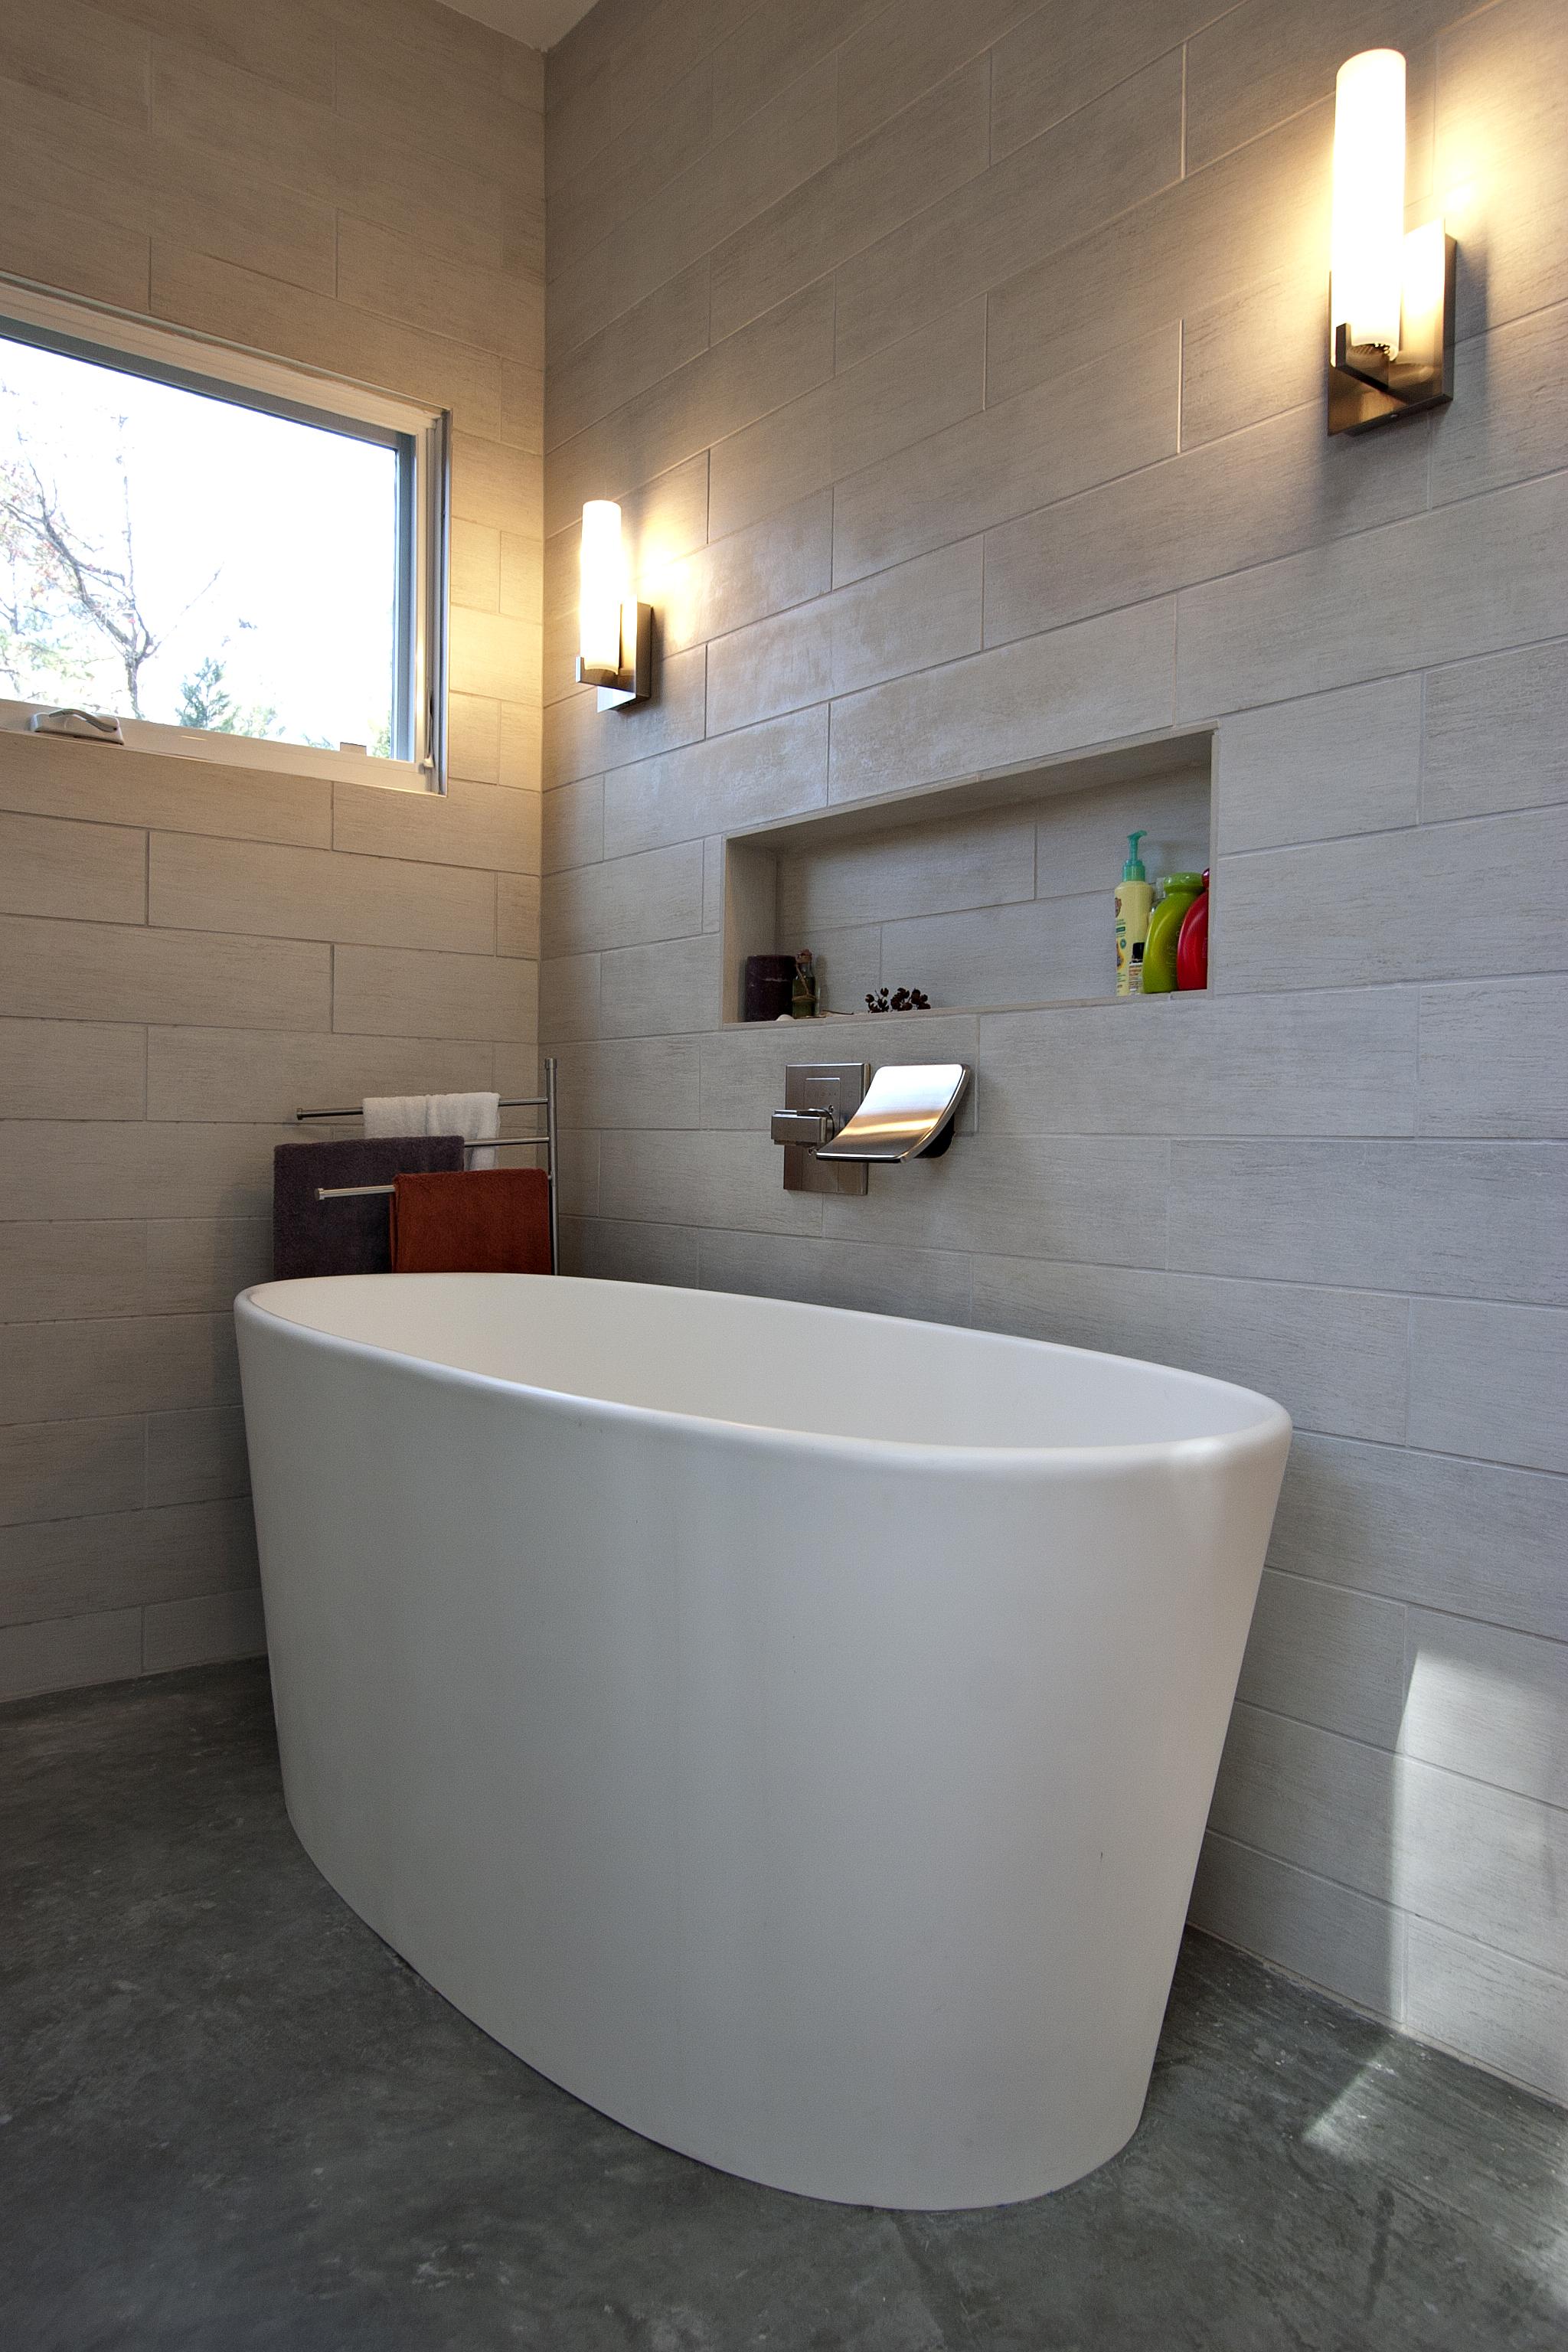 ovoid bathing apparatus.jpg